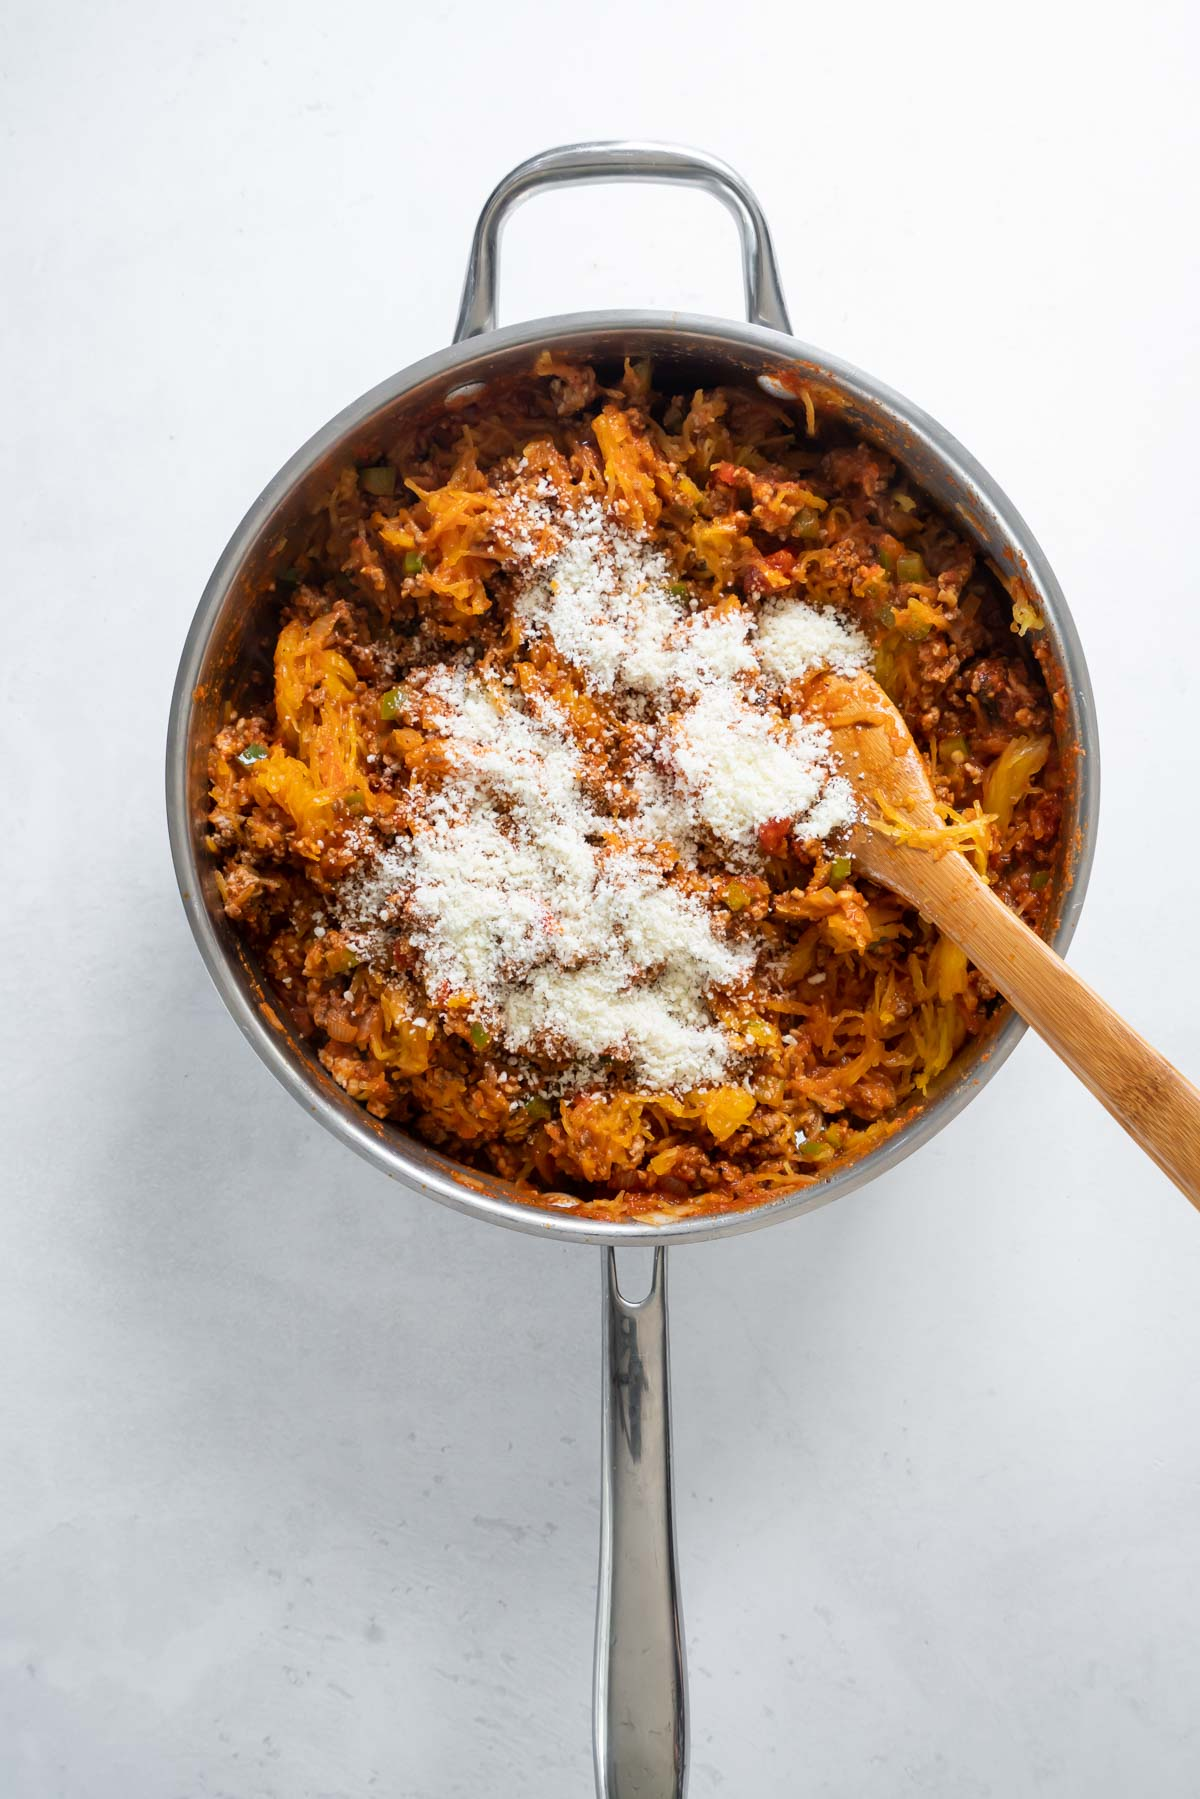 stirring parmesan into spaghetti squash mixture